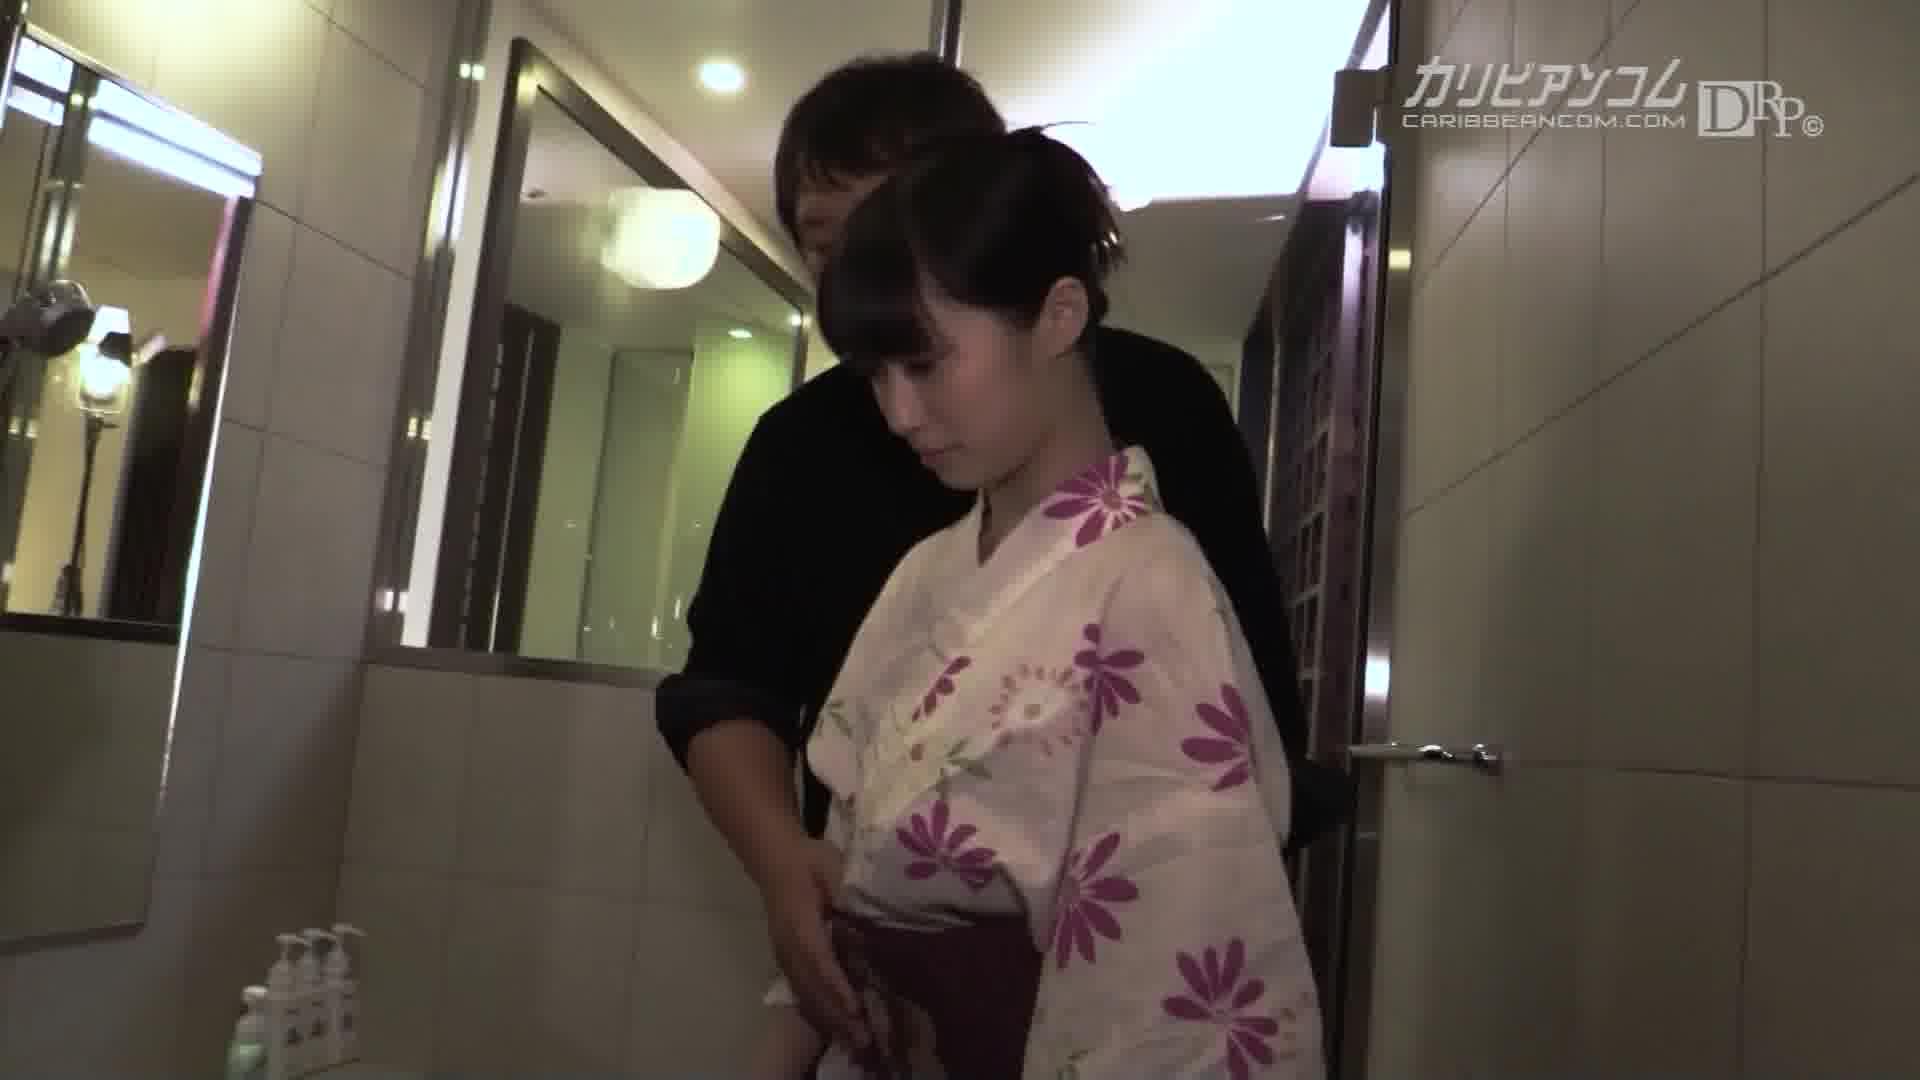 久々の密会不倫旅行 - 本澤朋美【コスプレ・水着・浴衣】